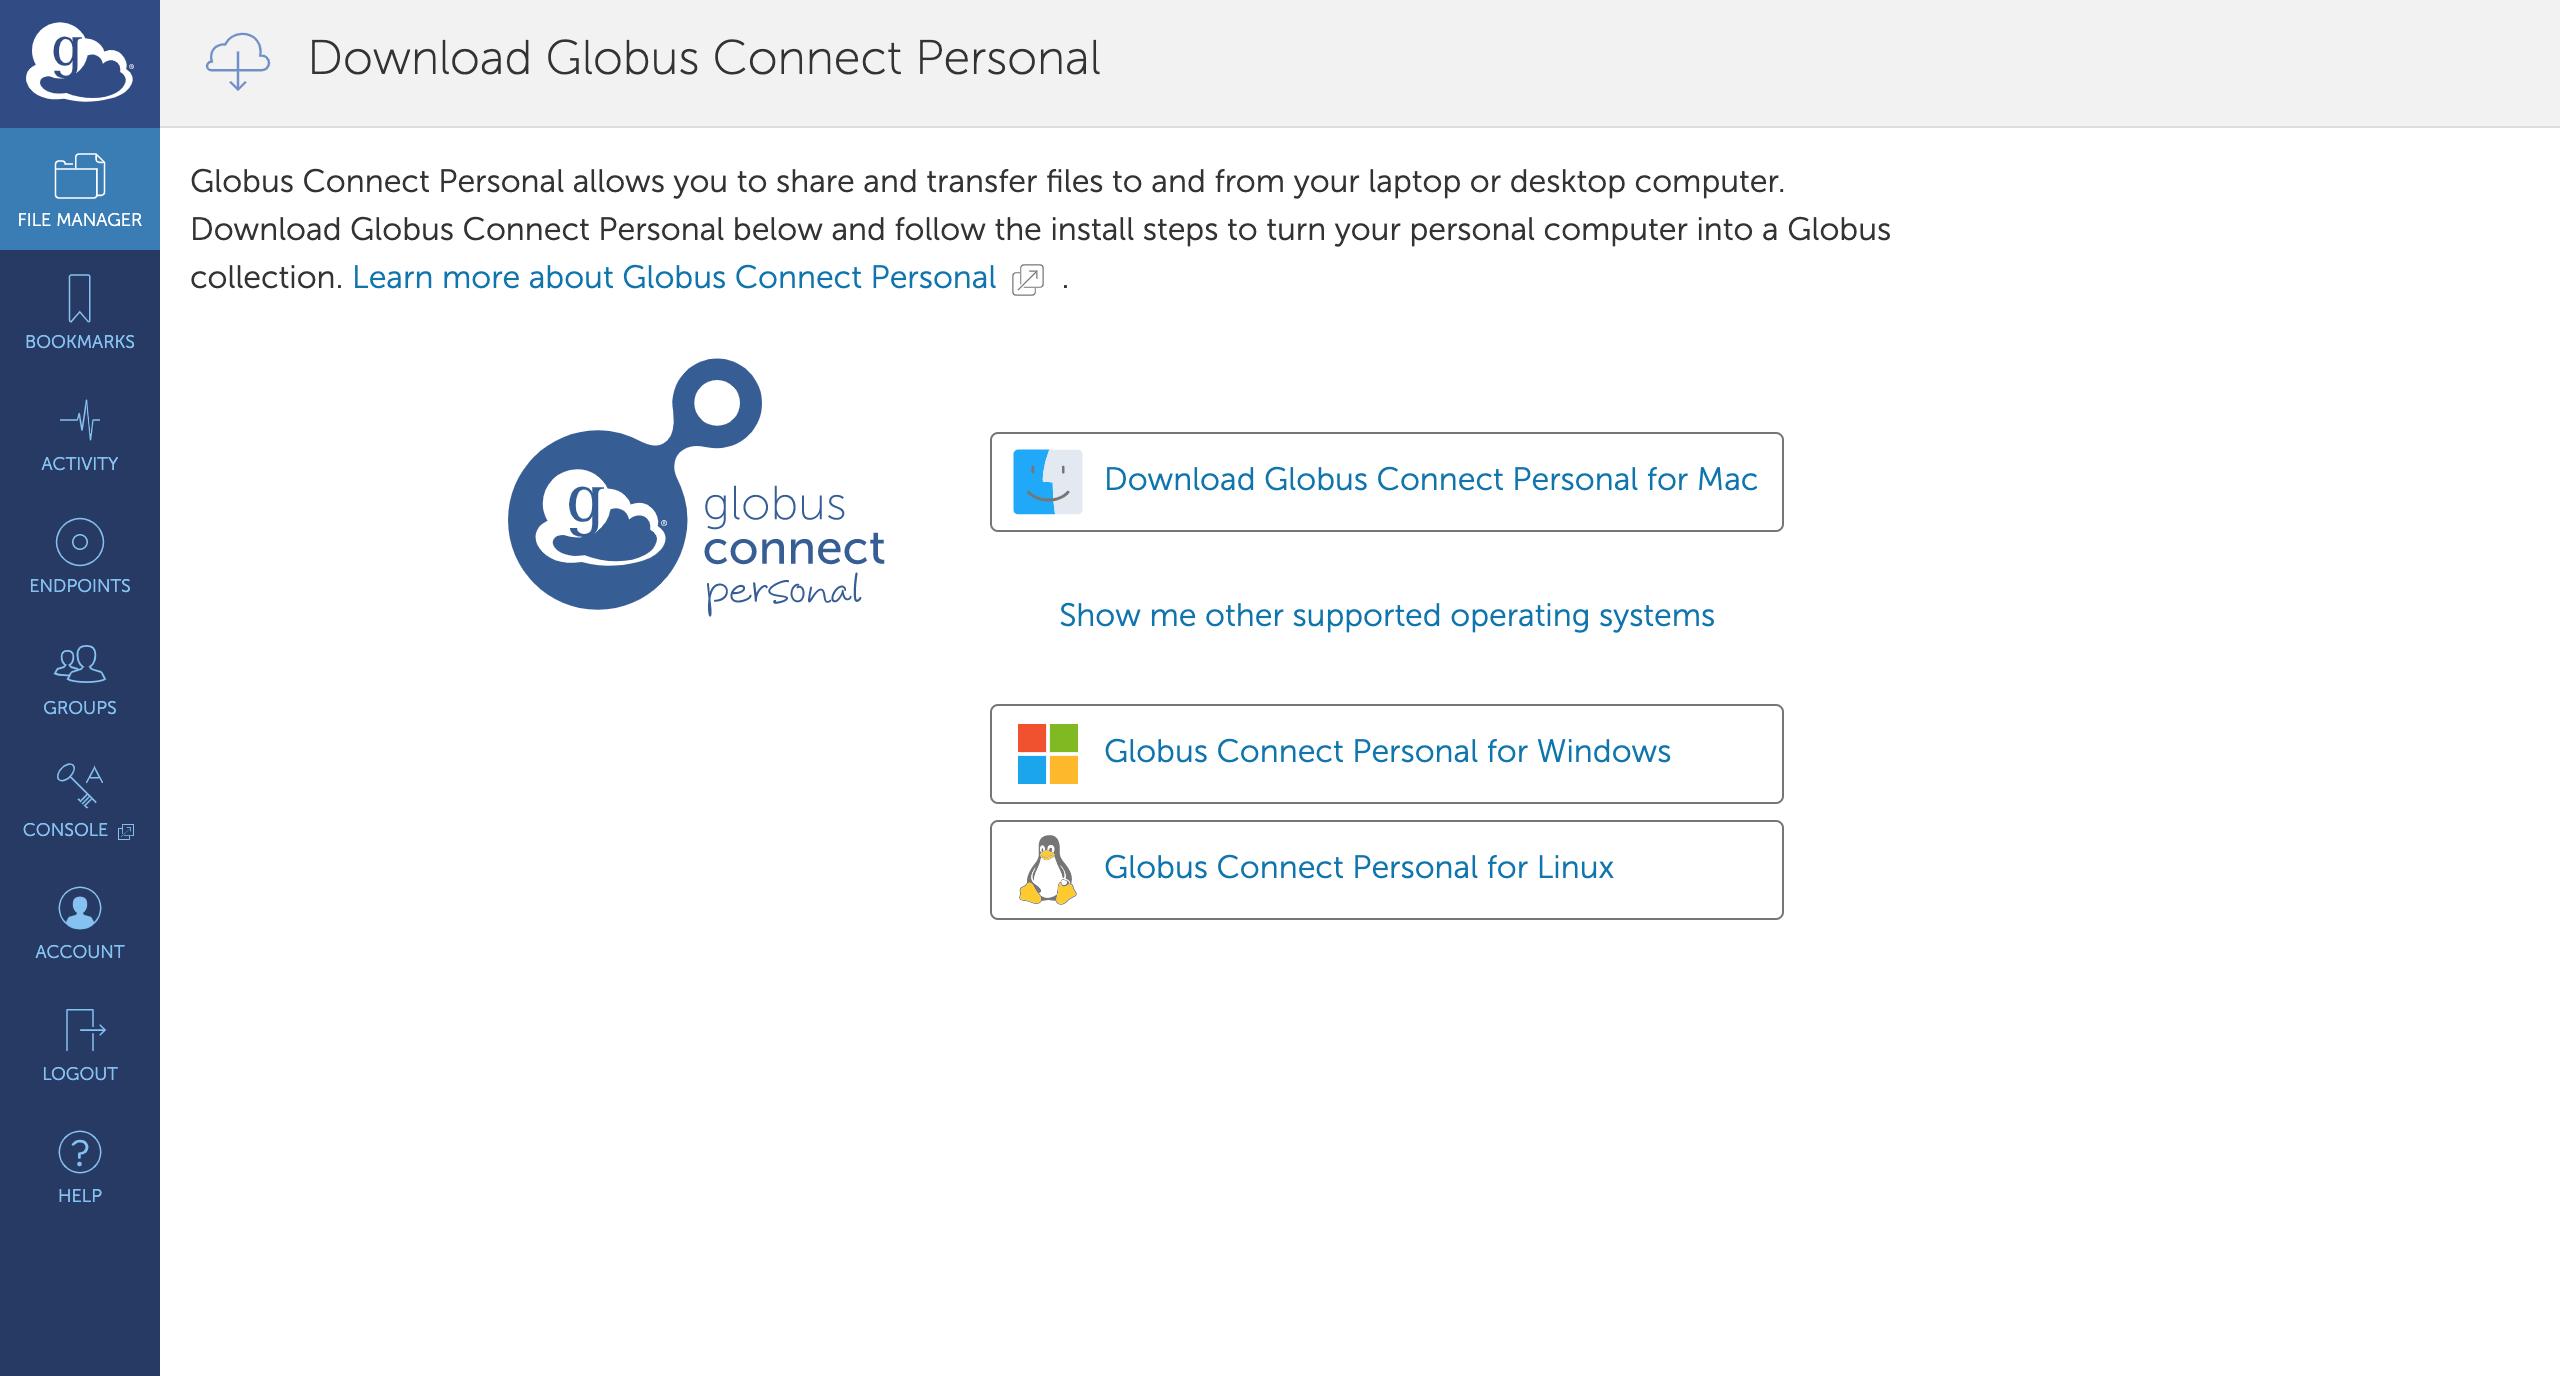 getting_started/images/globus-fm-download.png